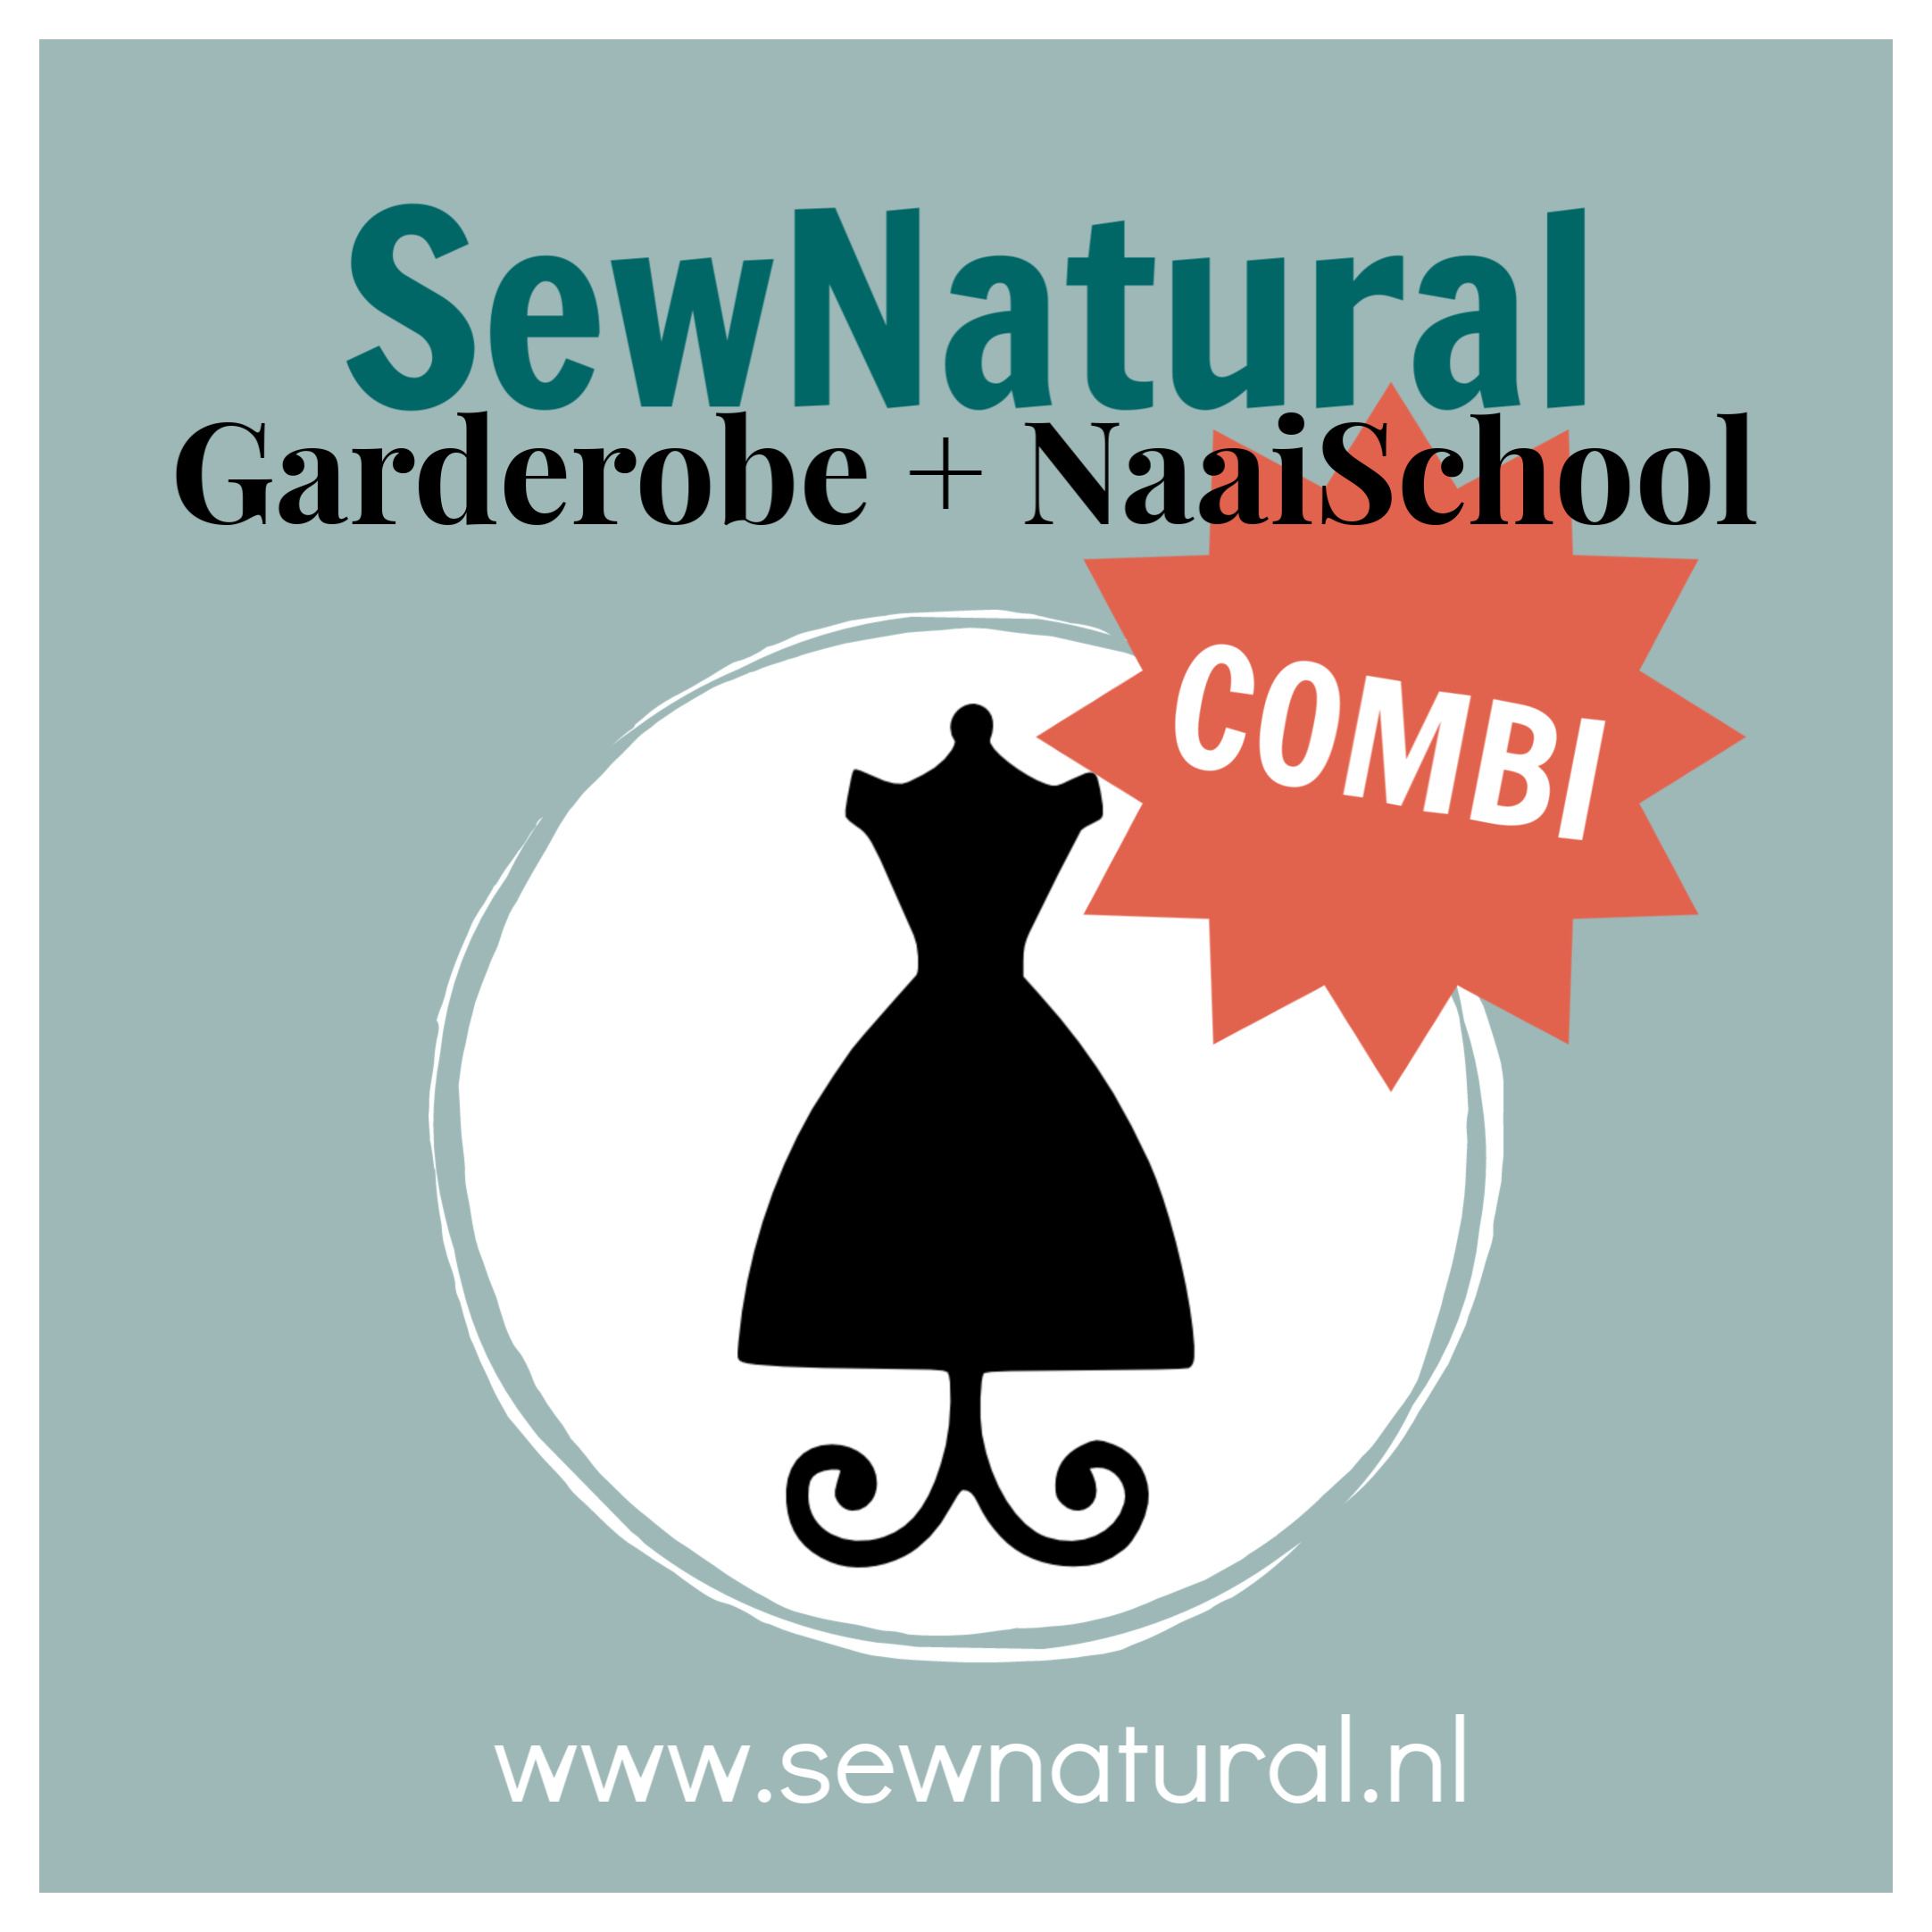 SewNatural Garderobe